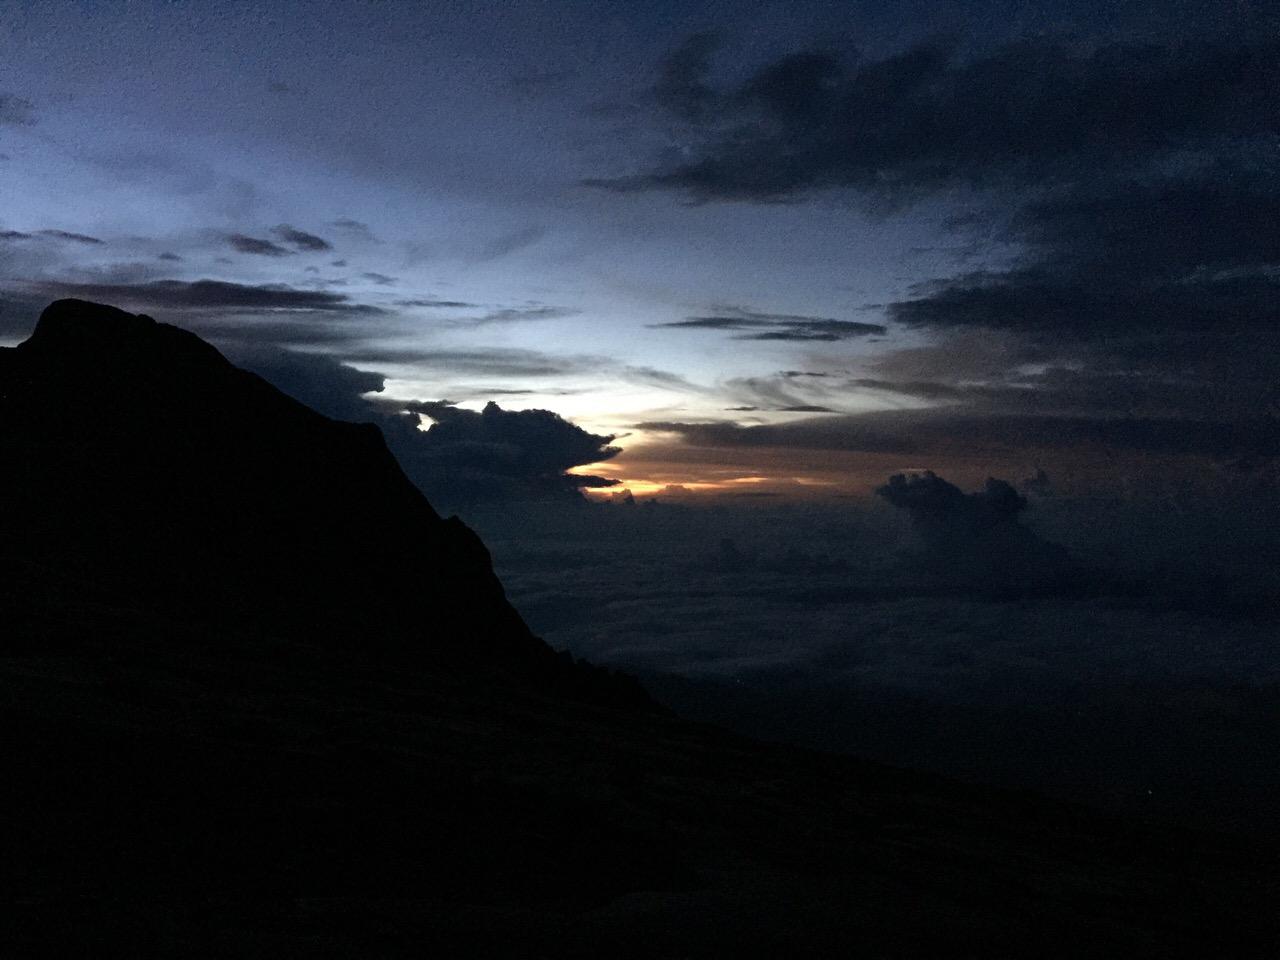 Kota Kinabalu climbing 4145